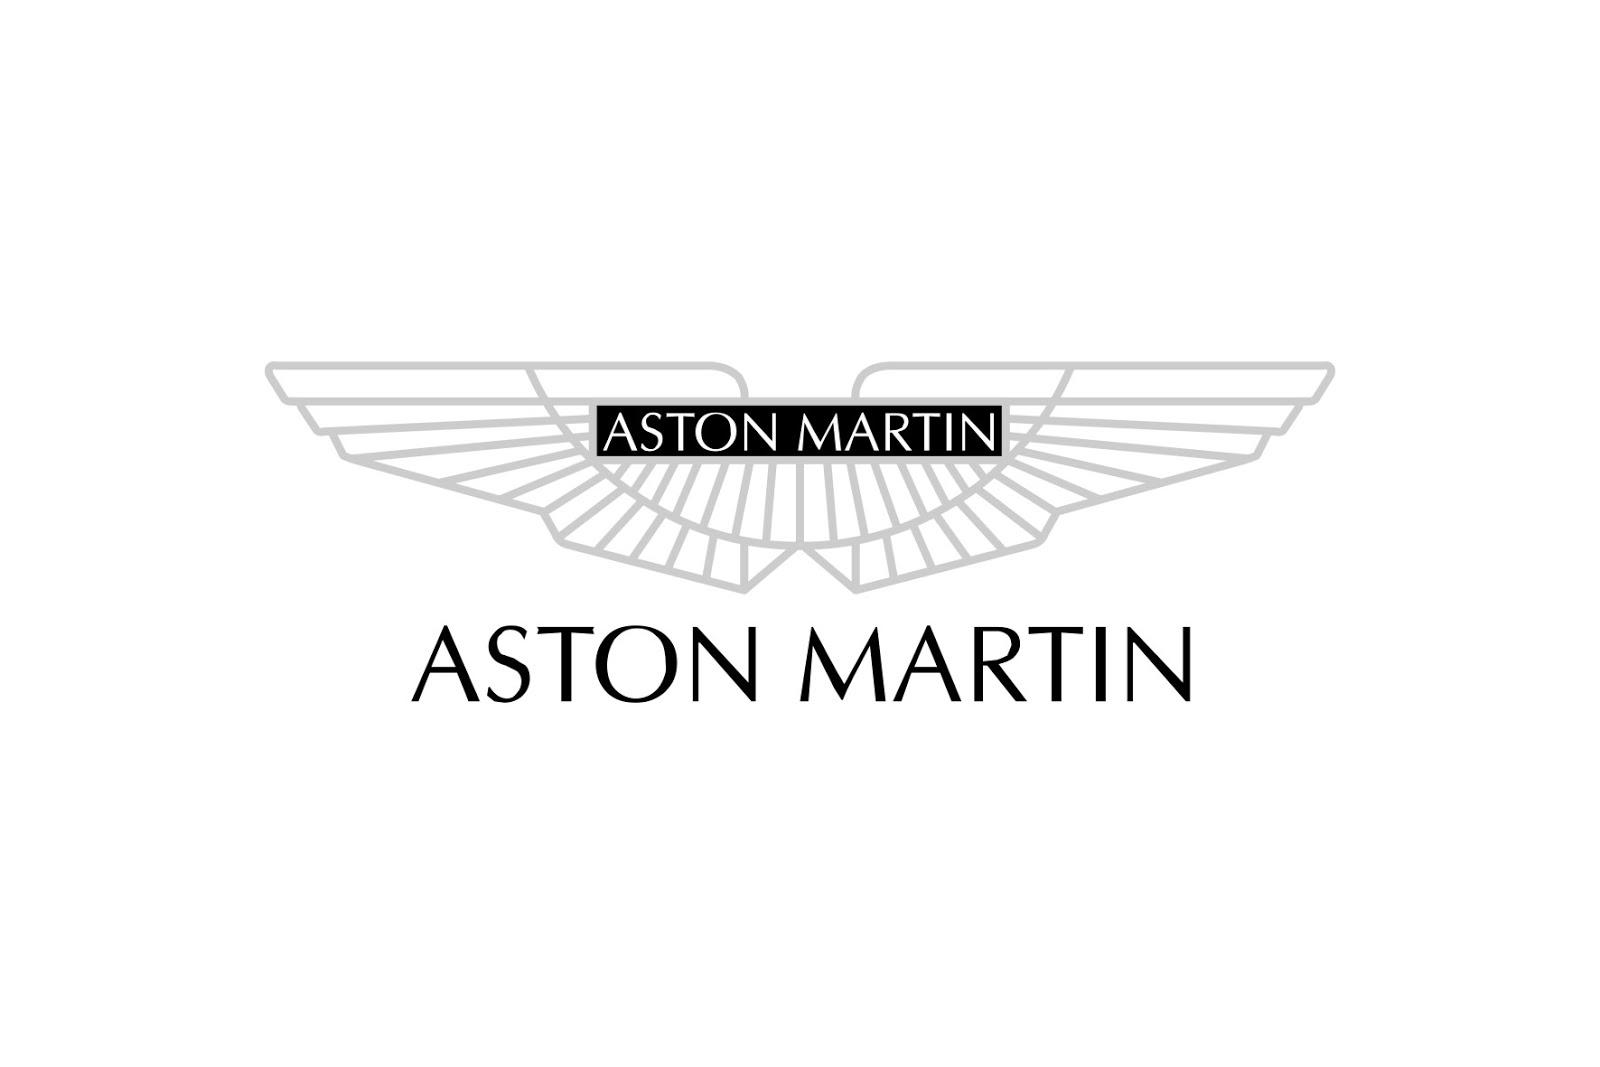 aston martin logo. Black Bedroom Furniture Sets. Home Design Ideas